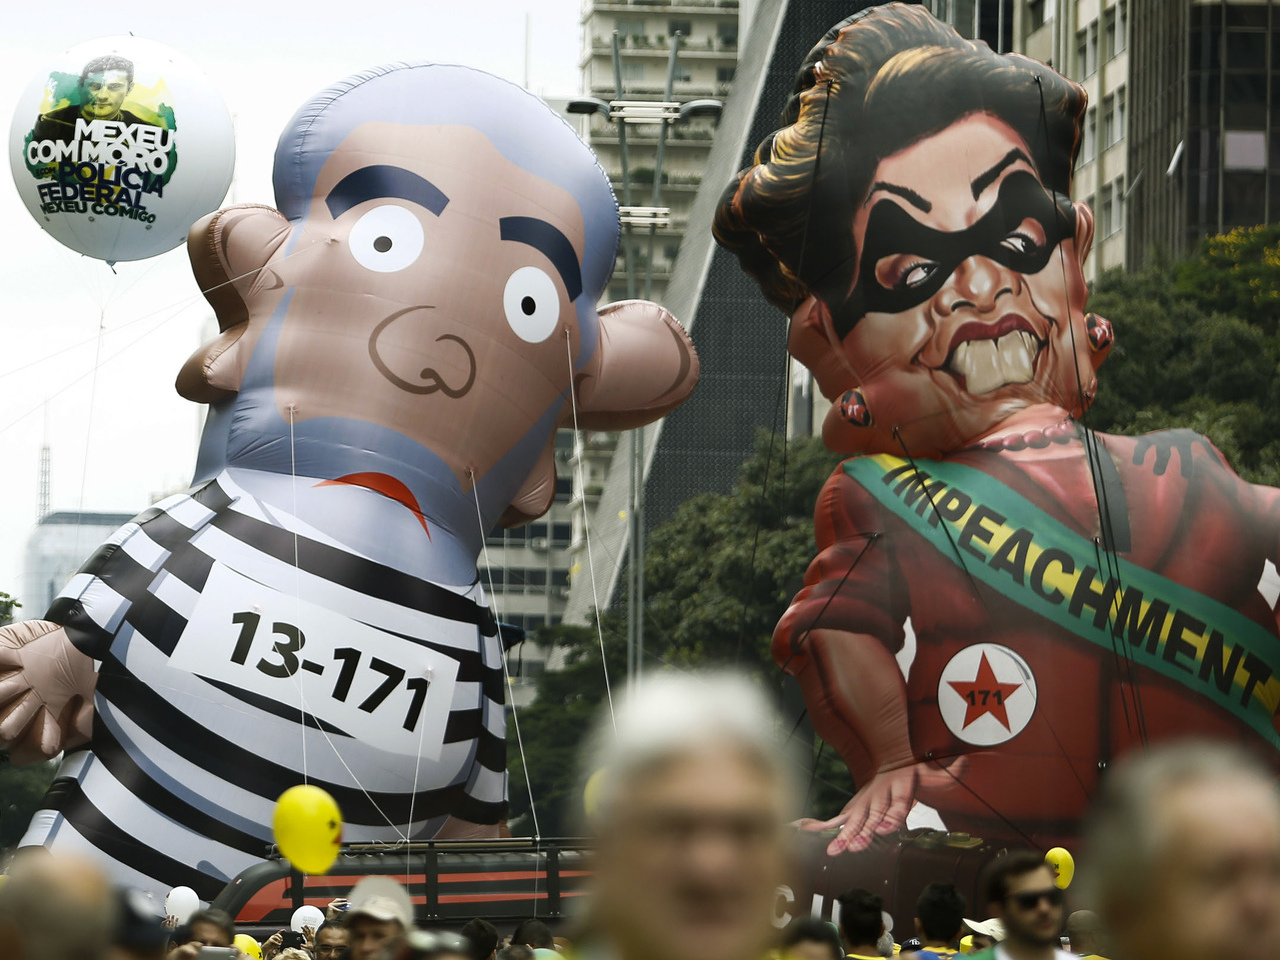 Fora Lula, fora Dilma